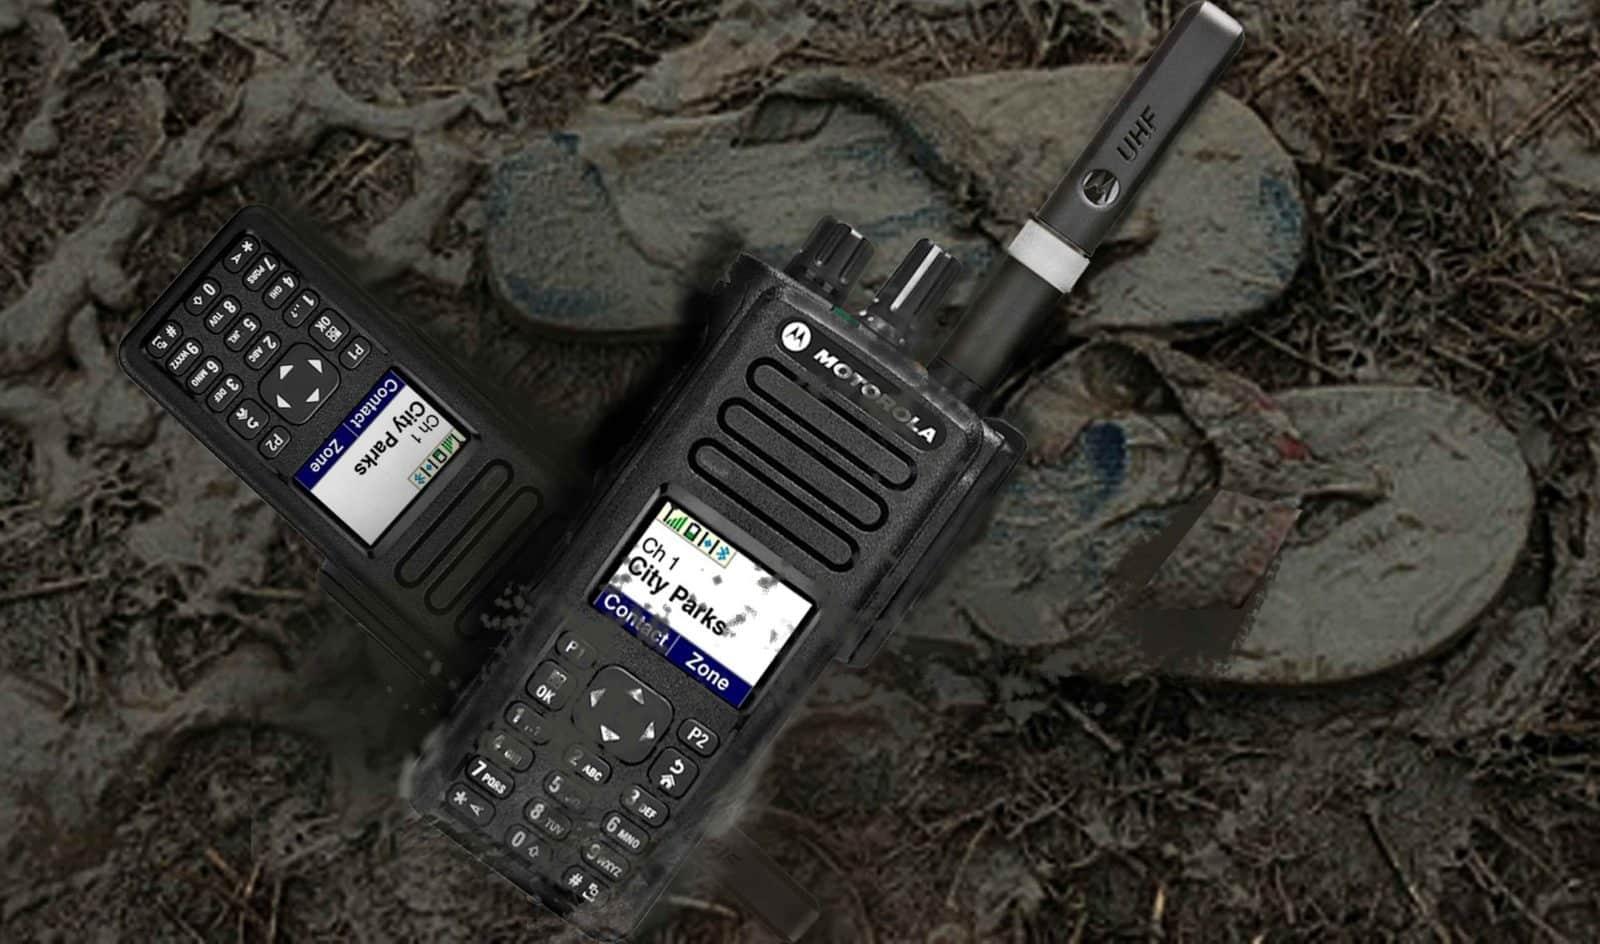 DP4801e UHF VHF 1000 Channel